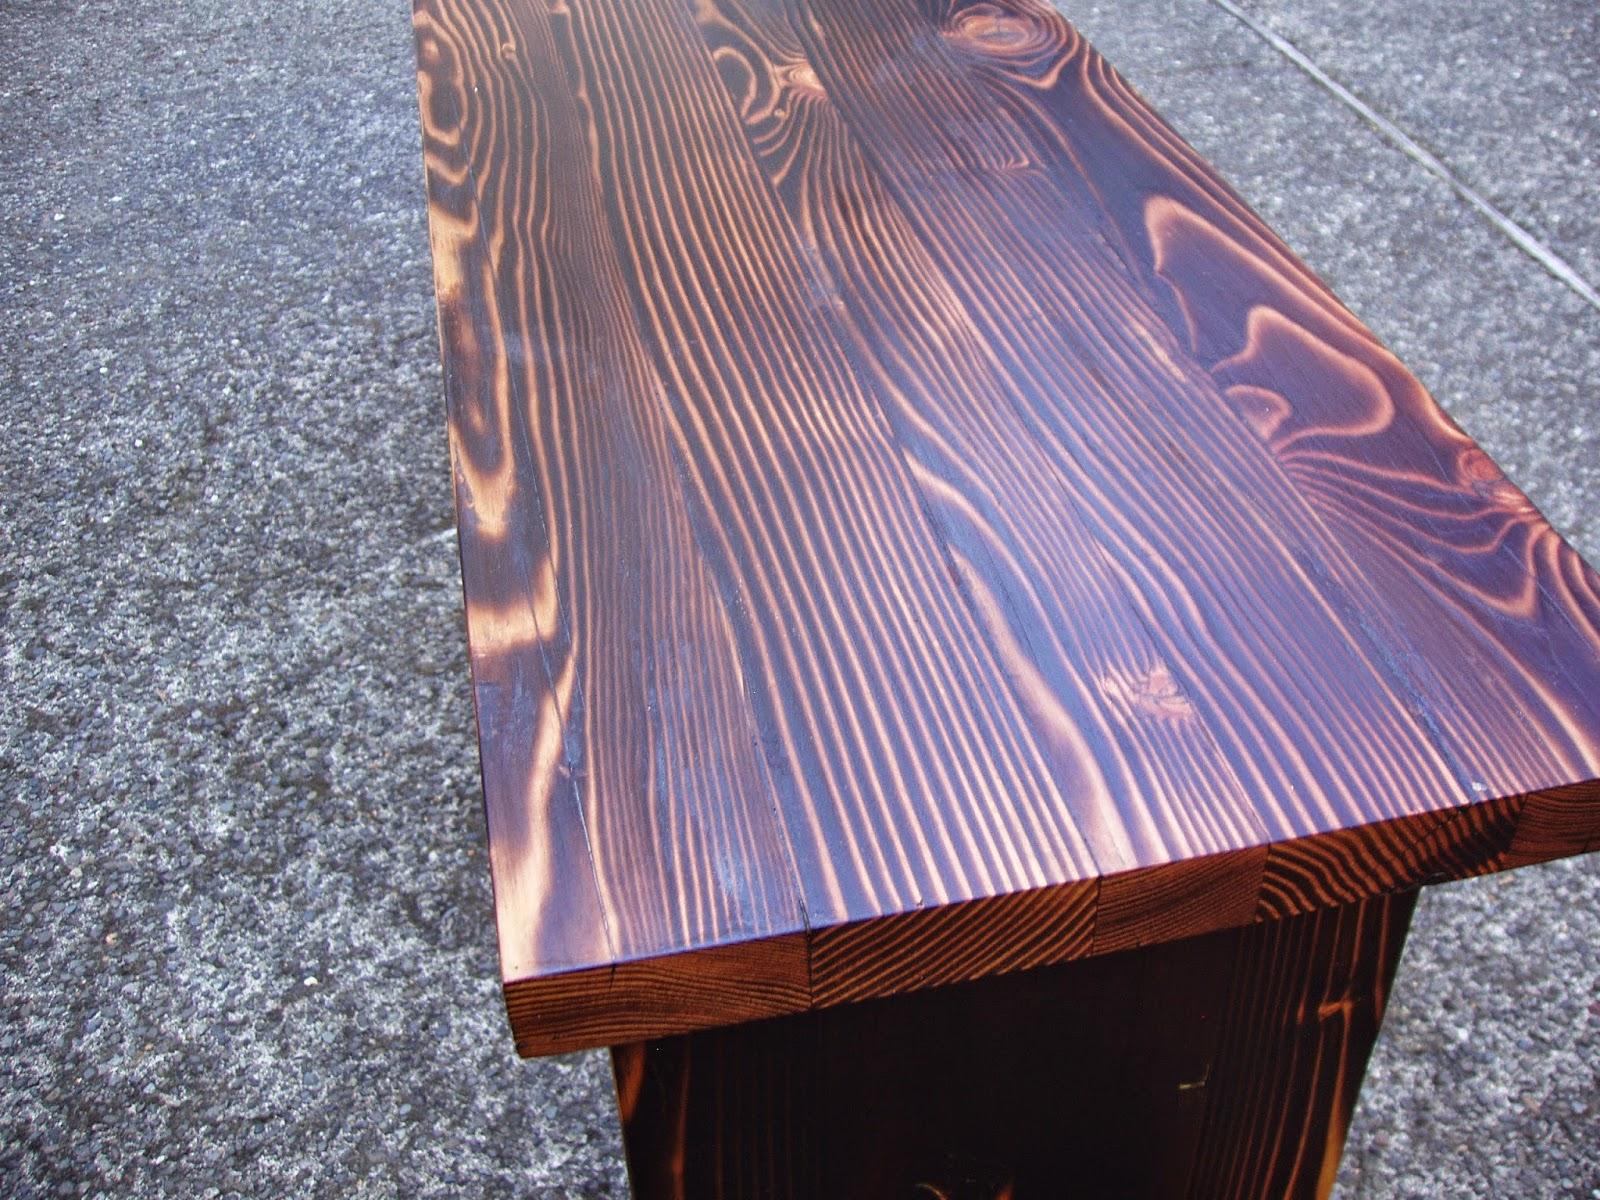 pnw shou sugi ban bench in reclaimed douglas fir. Black Bedroom Furniture Sets. Home Design Ideas